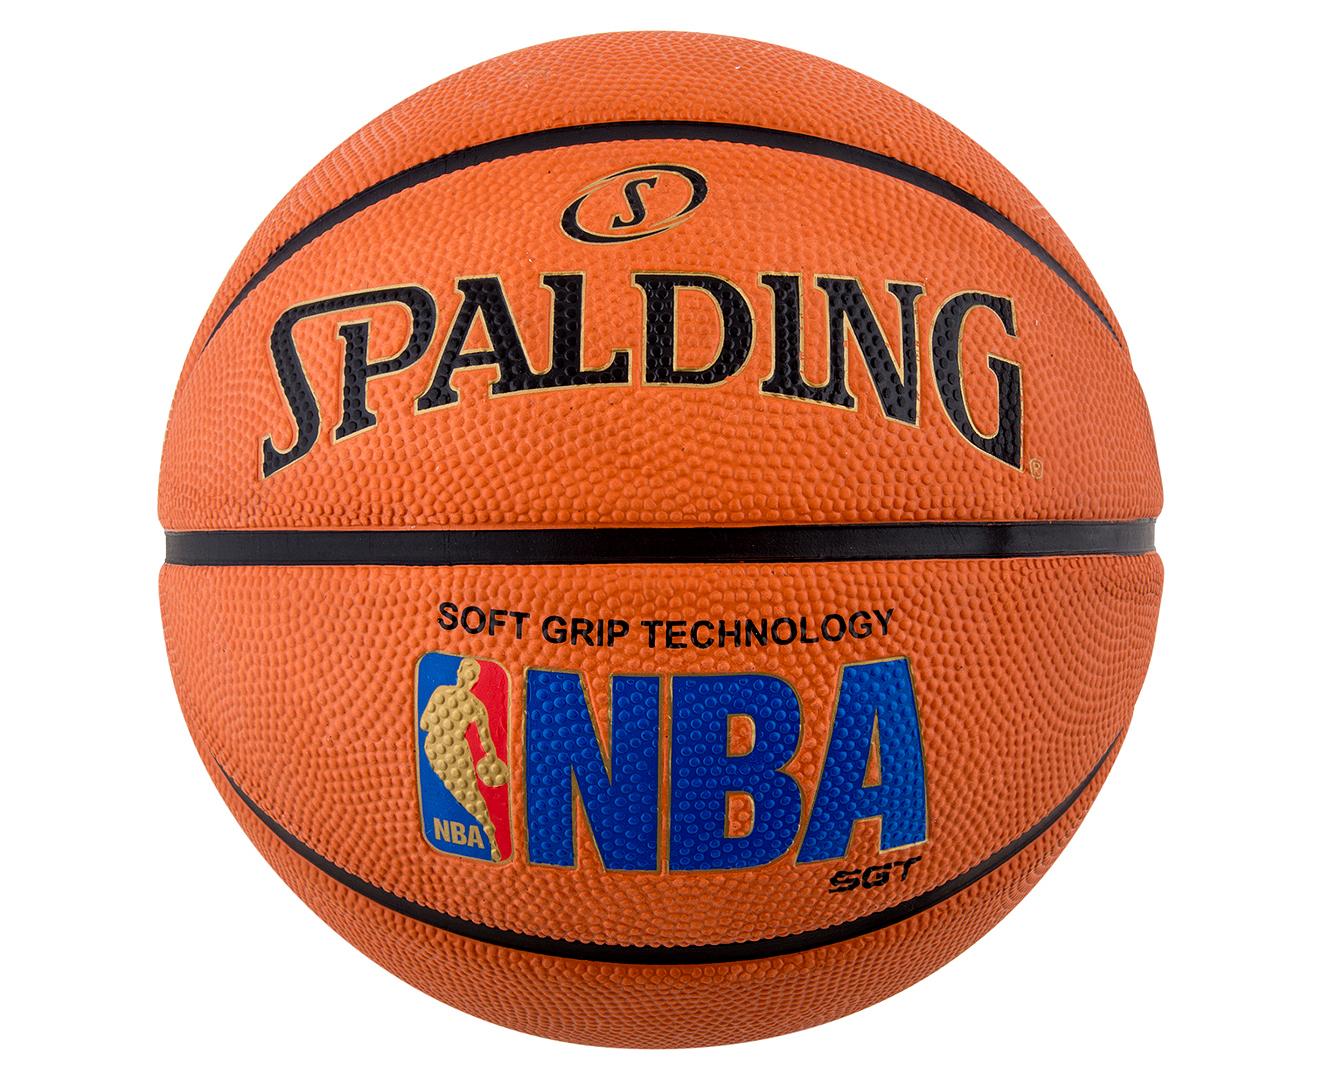 SPALDING NBA Logoman Basketball - Size 7 9319966613805